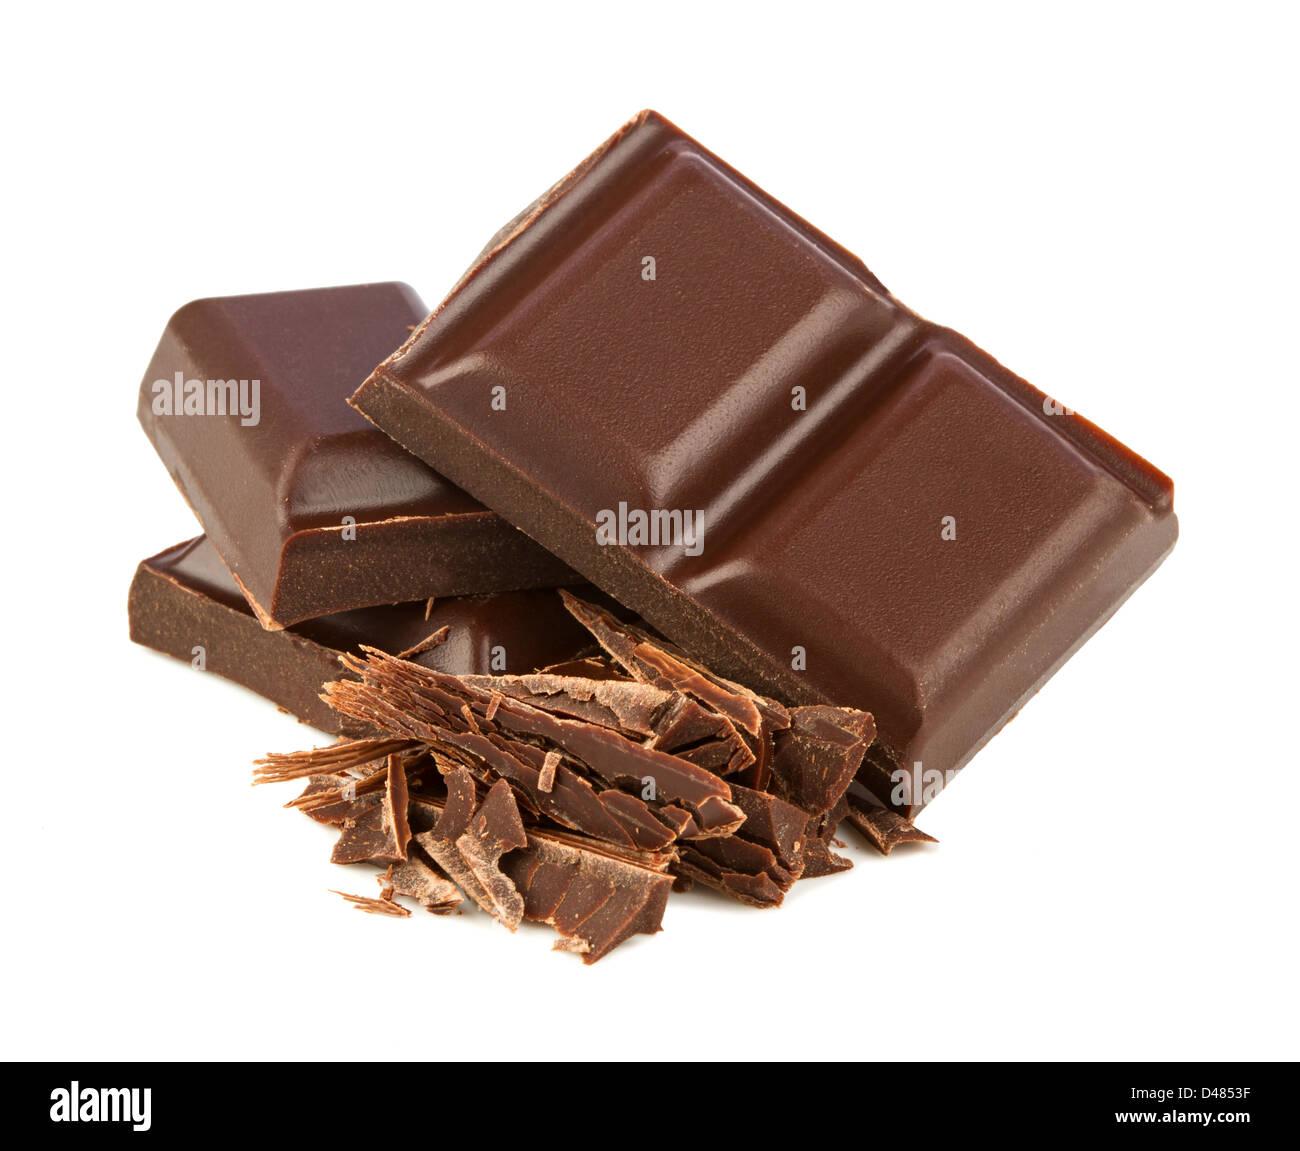 Pile de chocolat noir Photo Stock